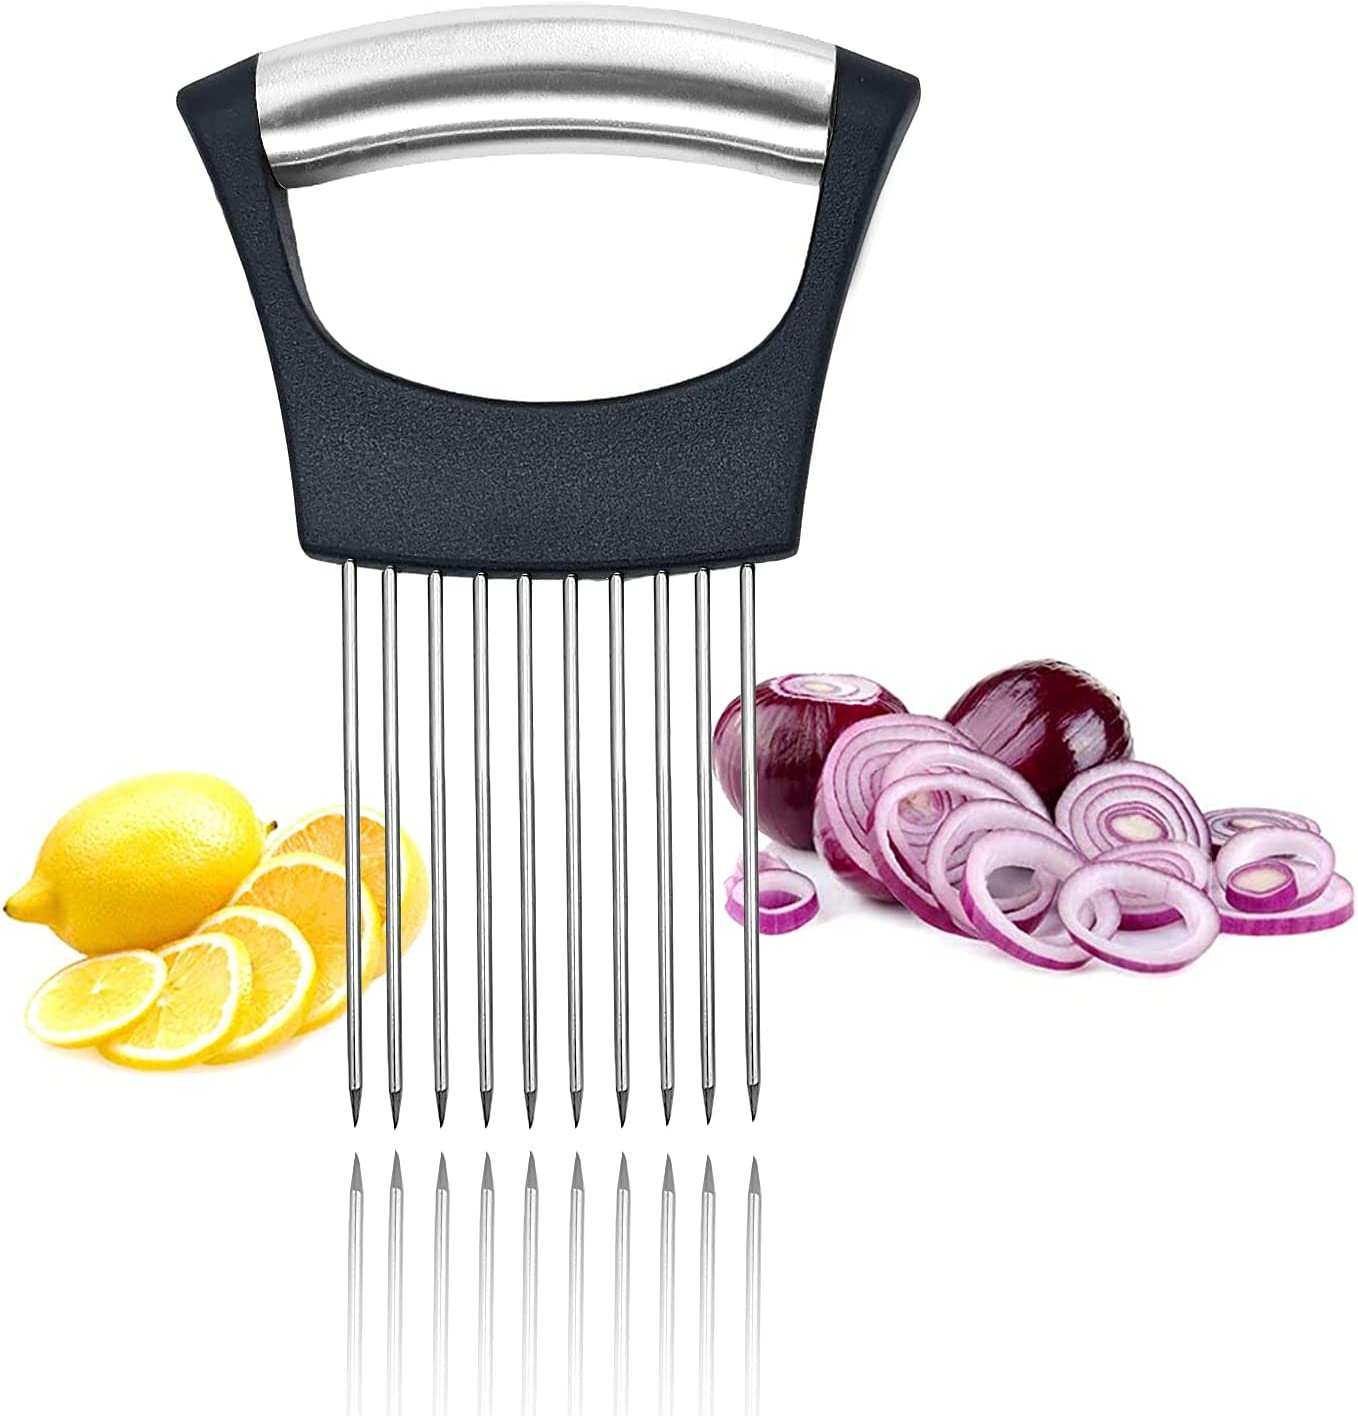 WAEKIYTL Onion Slicer, Vegetable Tomato Cutter Onion Holder Slicer Meat Slicer 304 Stainless Steel Food Slice Assistant Tool, Kitchen Gadget Onion Cutter Tenderizer Tool